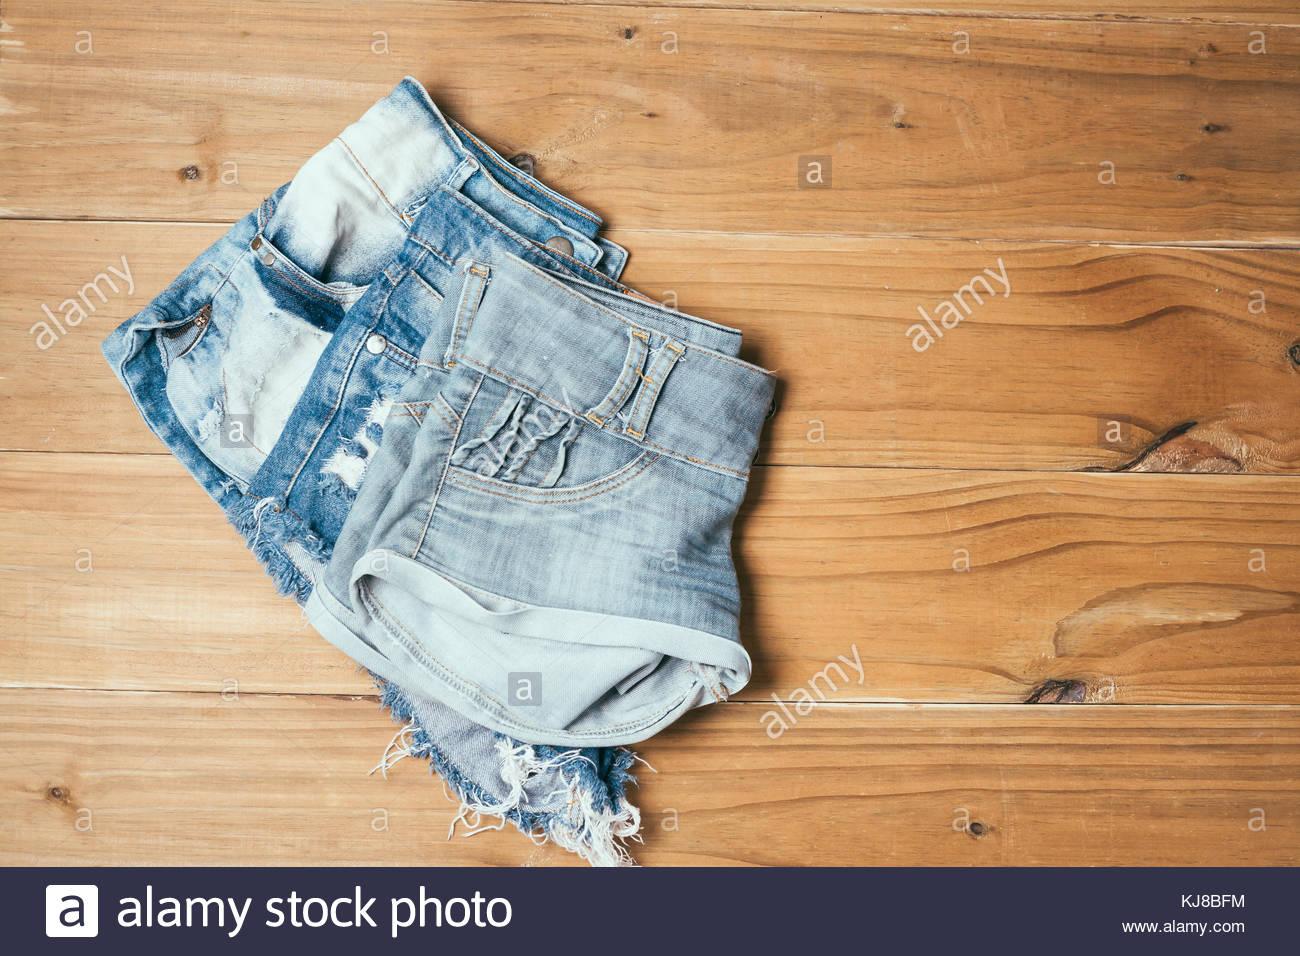 063411ec1f Hembra shorts pantalones vaqueros rasgados azul sobre fondo antiguo de  madera Imagen De Stock